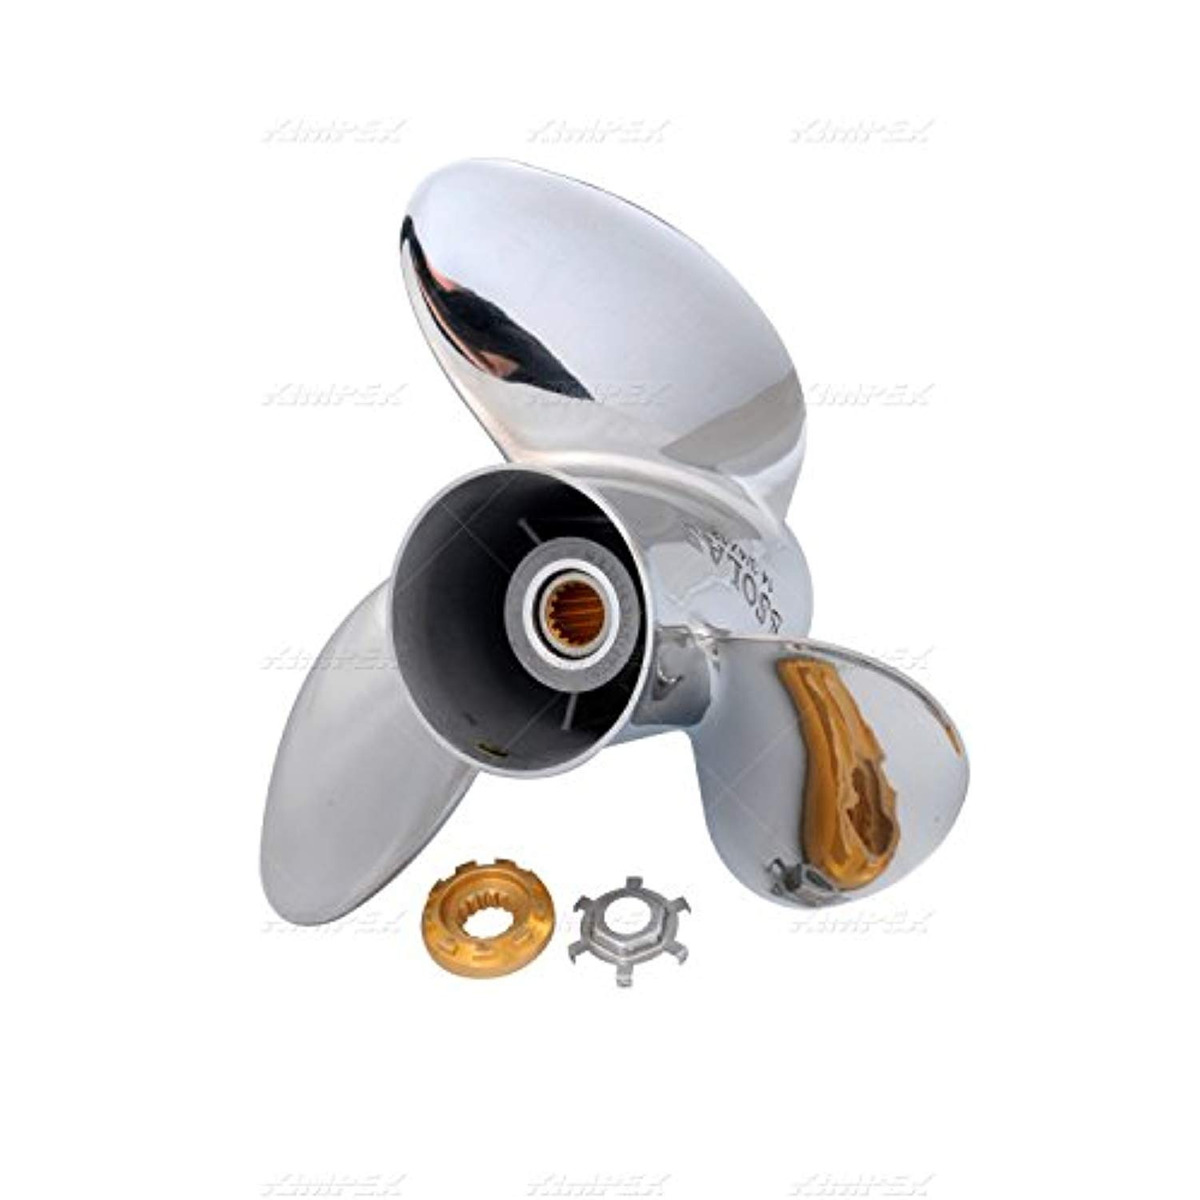 SOLAS Amita 3 Blade Aluminum 15 Dia X 15 Pitch SR